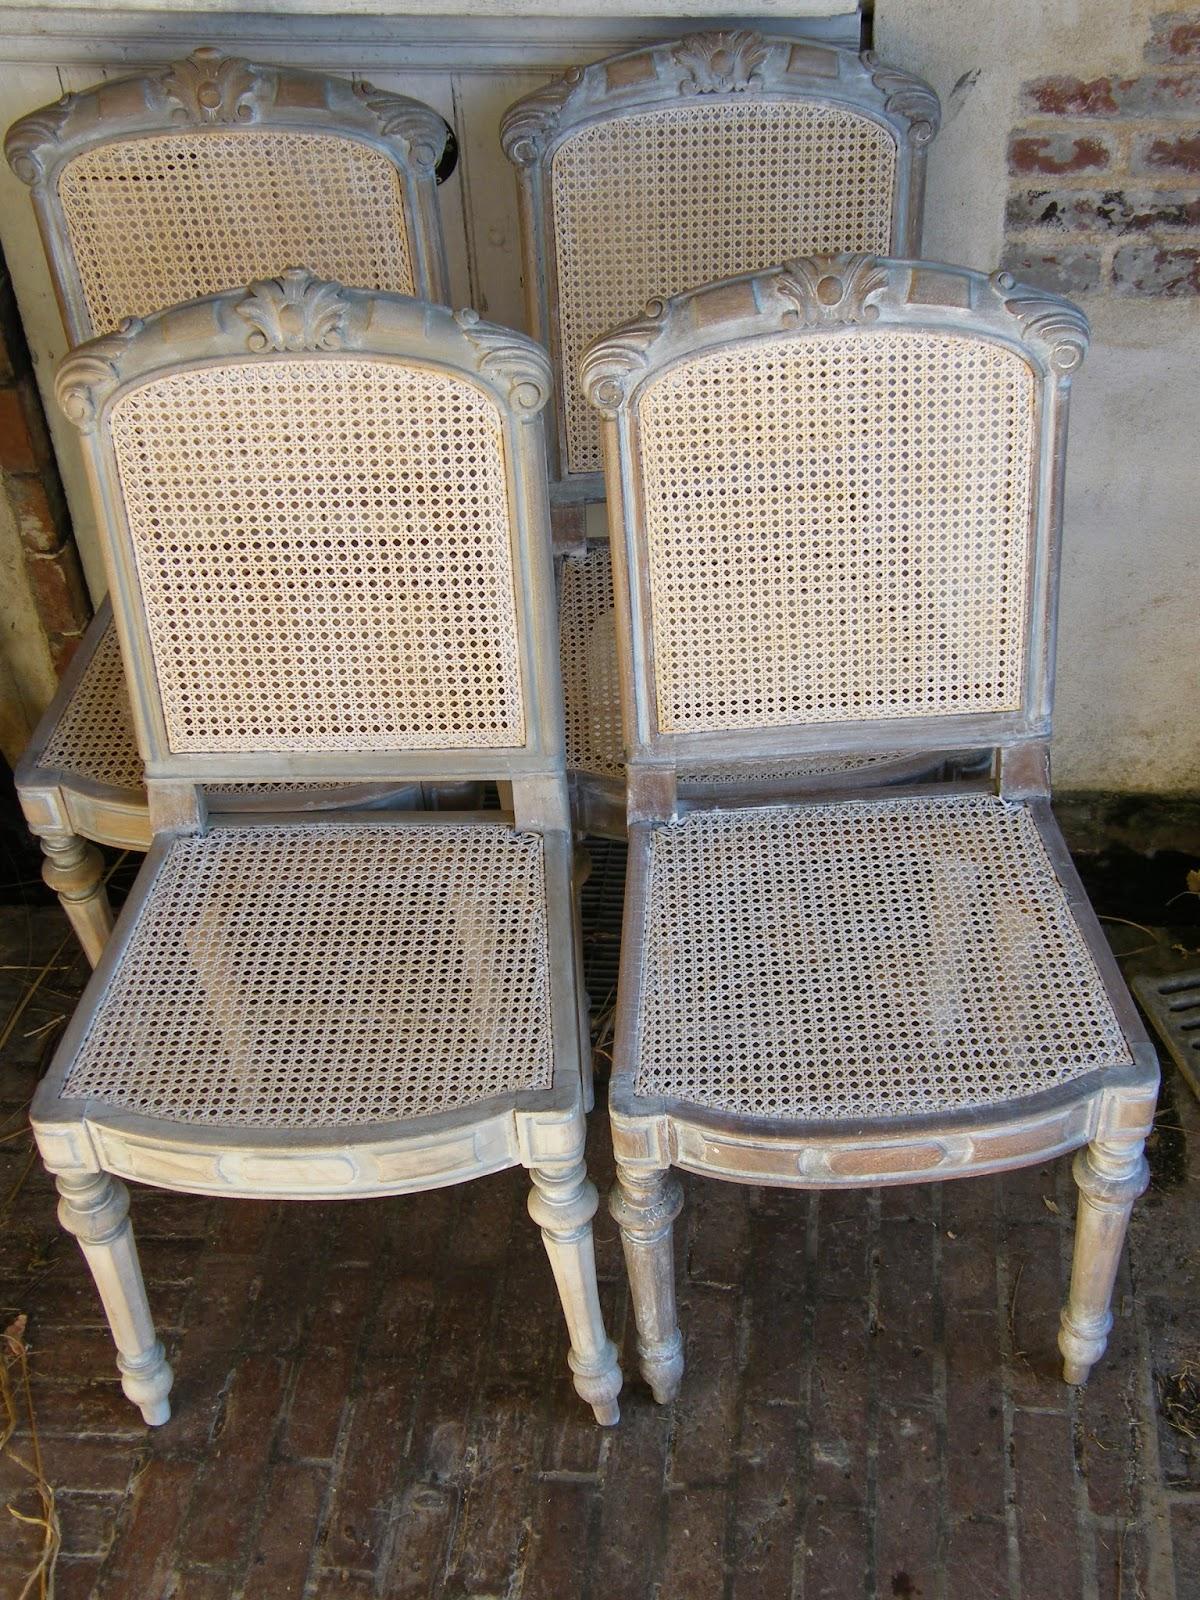 Chaise ceruse blanc beautiful chaise mdaillon en bois crus with chaise ceruse blanc best table - Restaurer une chaise ancienne ...